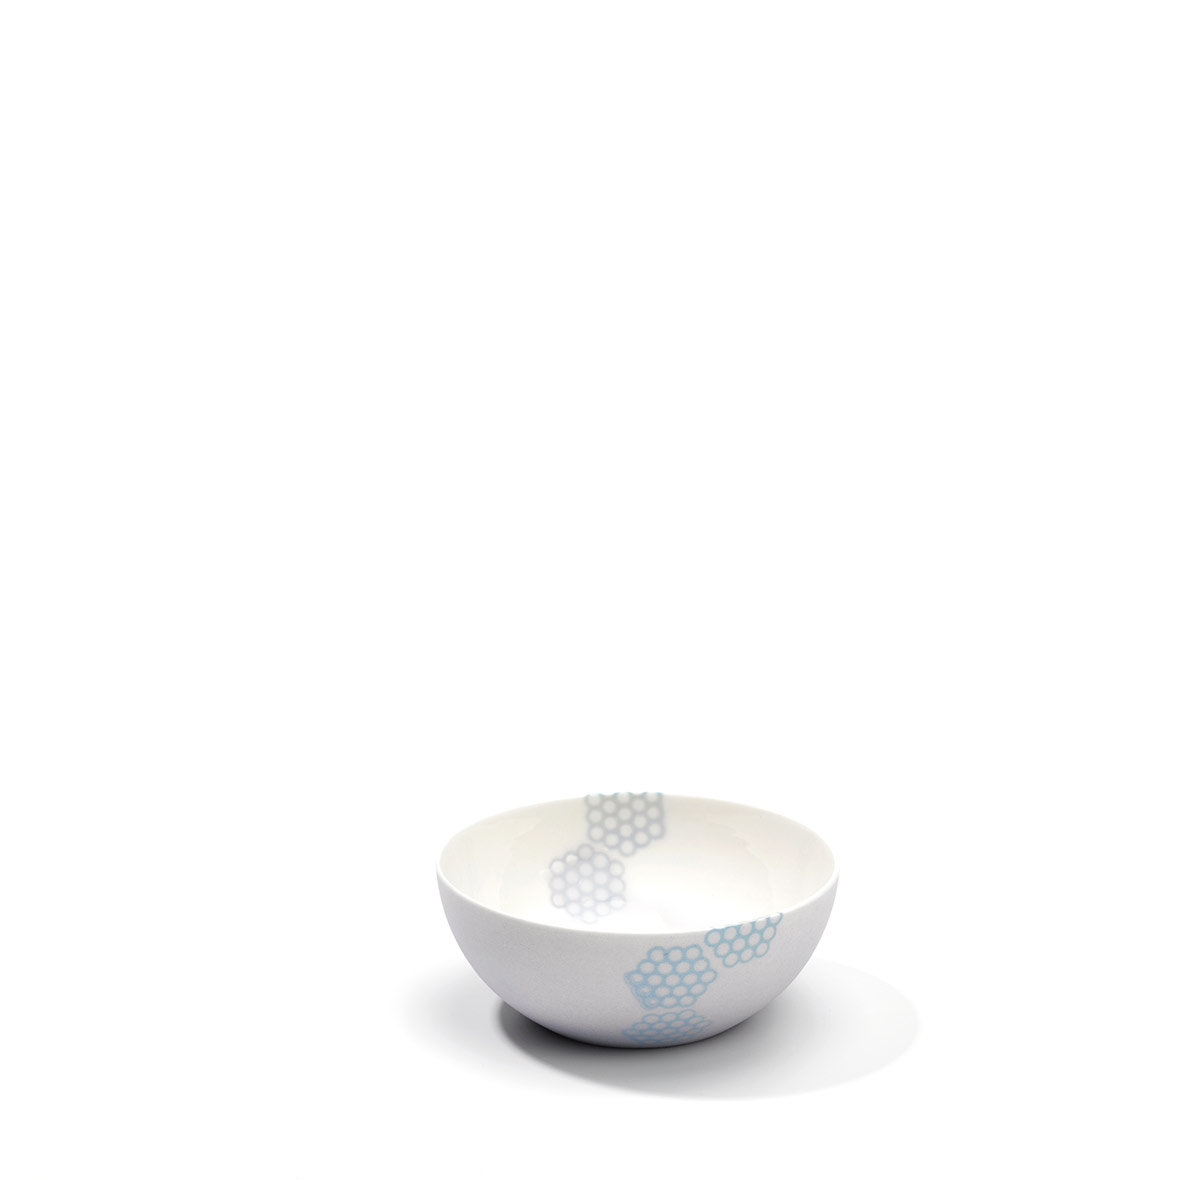 Kleine Teeschale - Porzellan - Wabenmuster - hellblau - helllila - grau